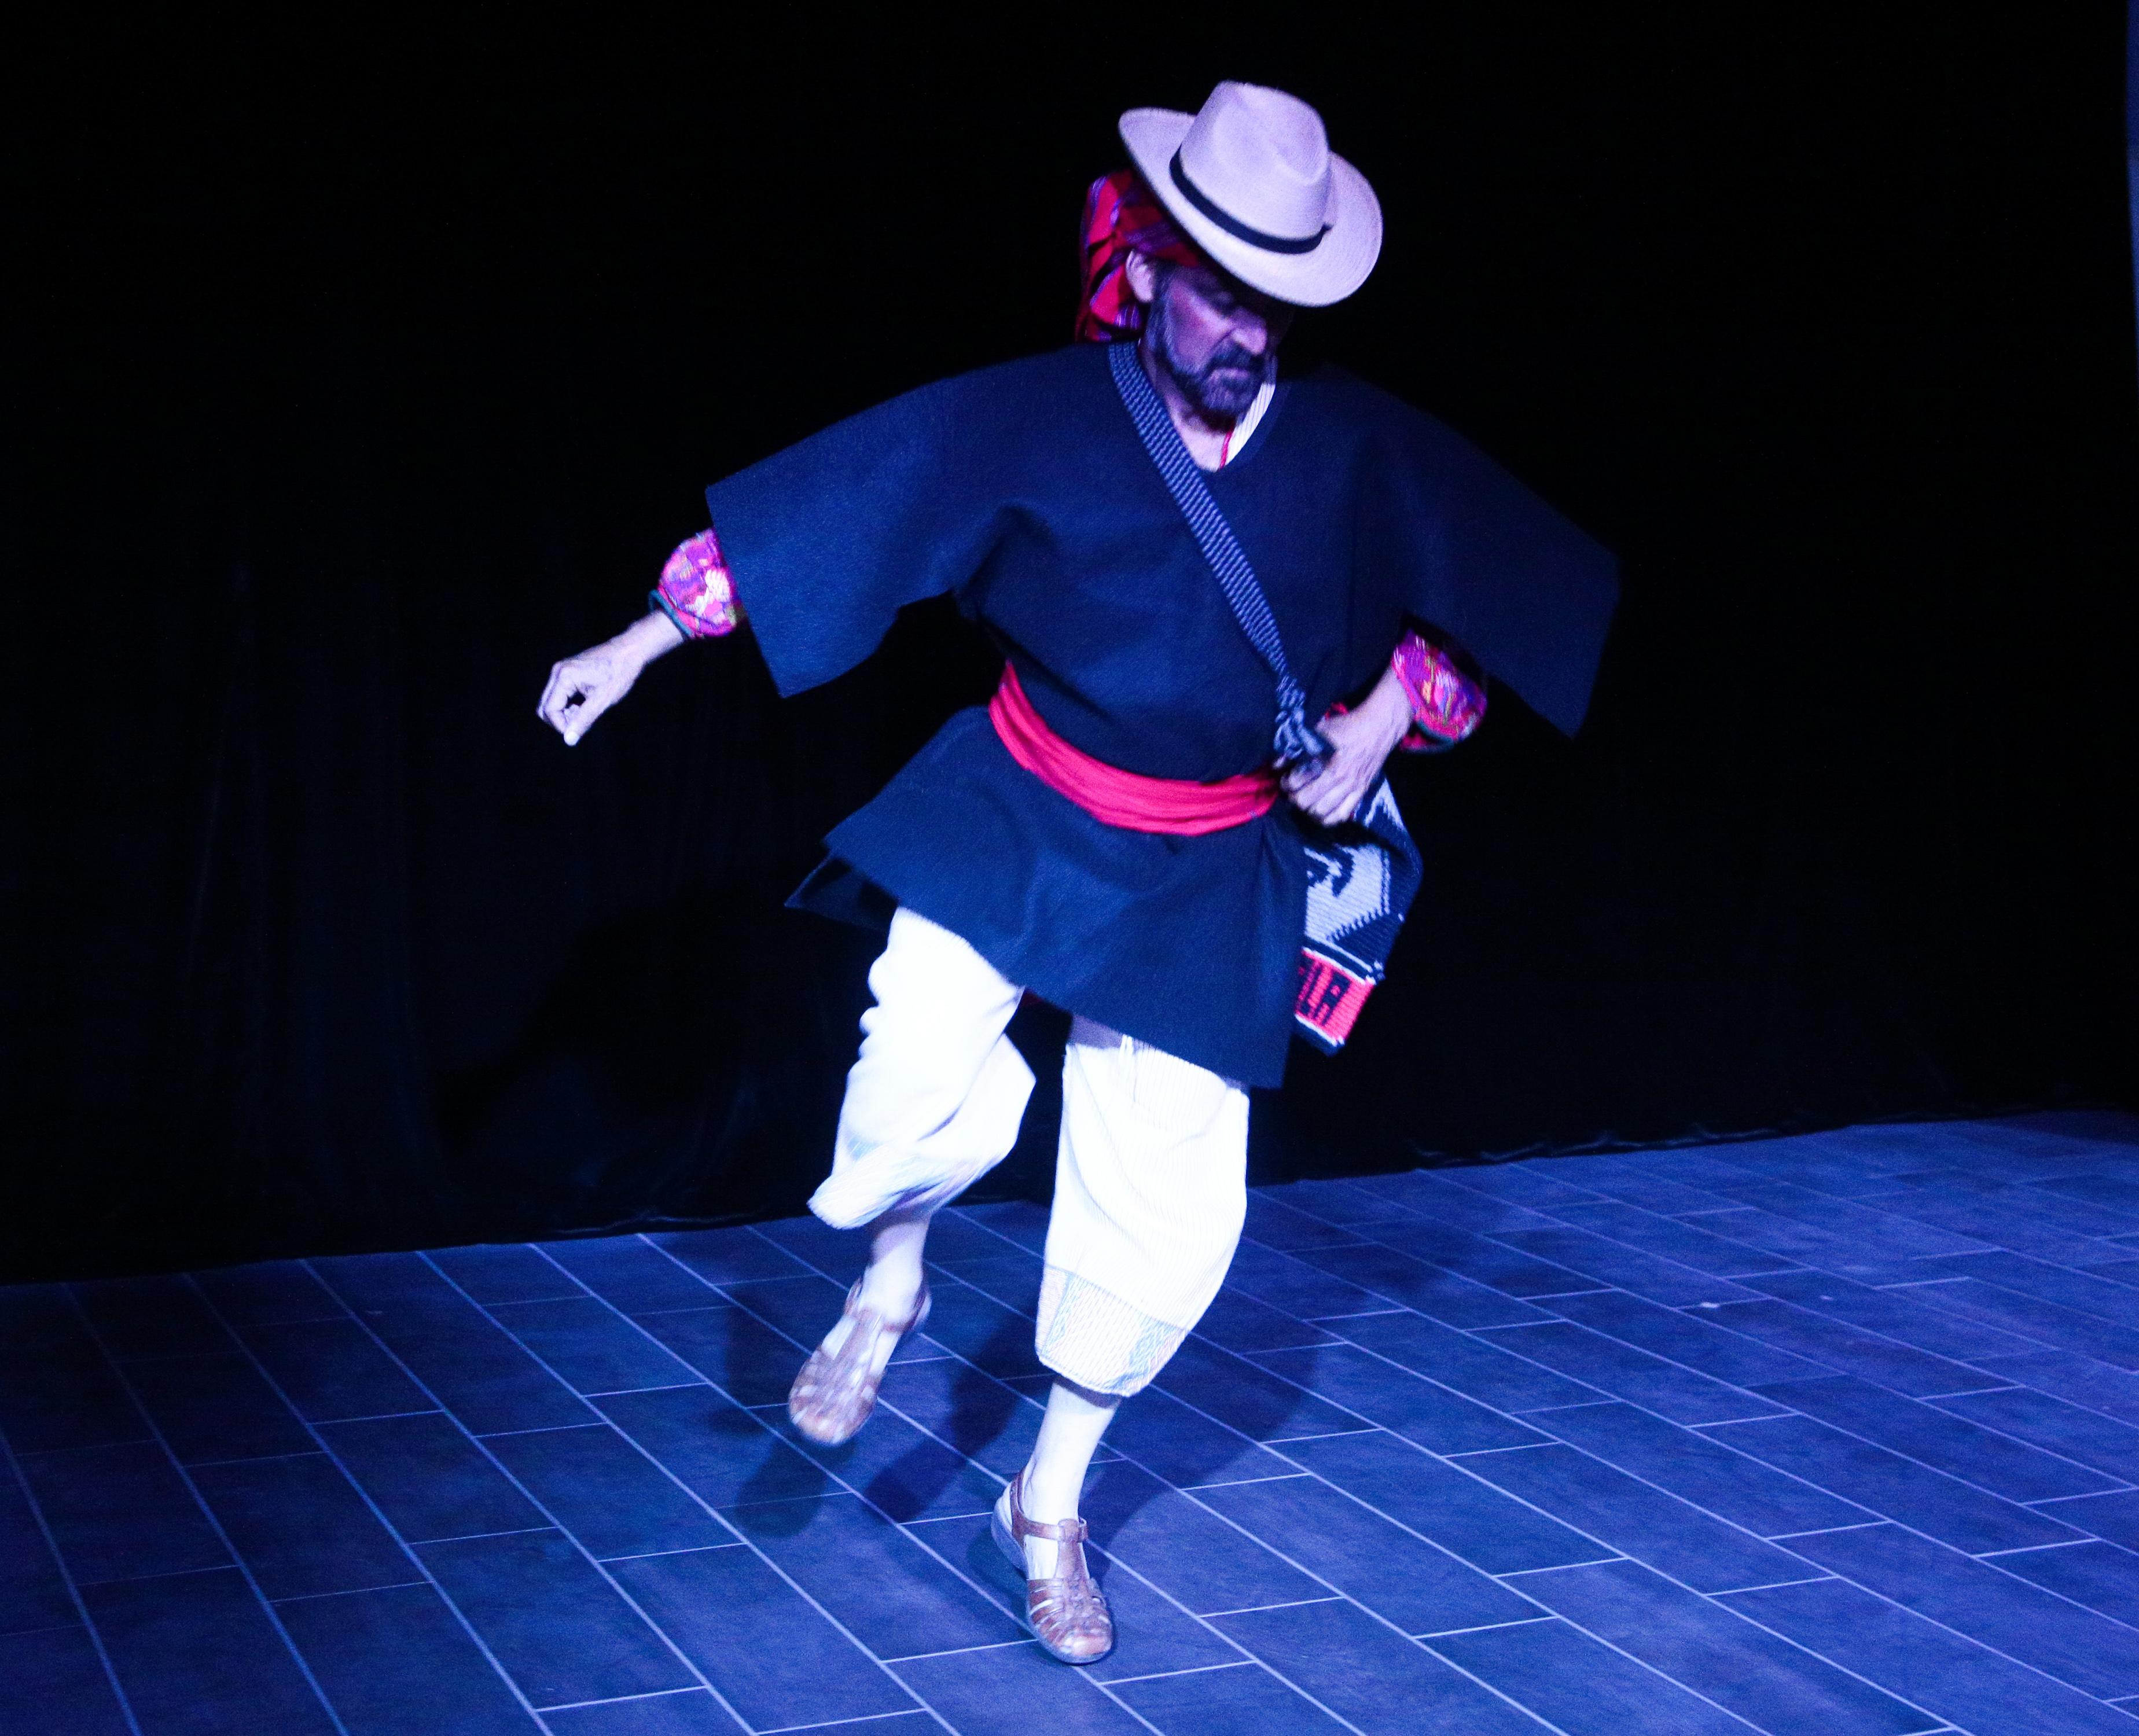 solodance escenario